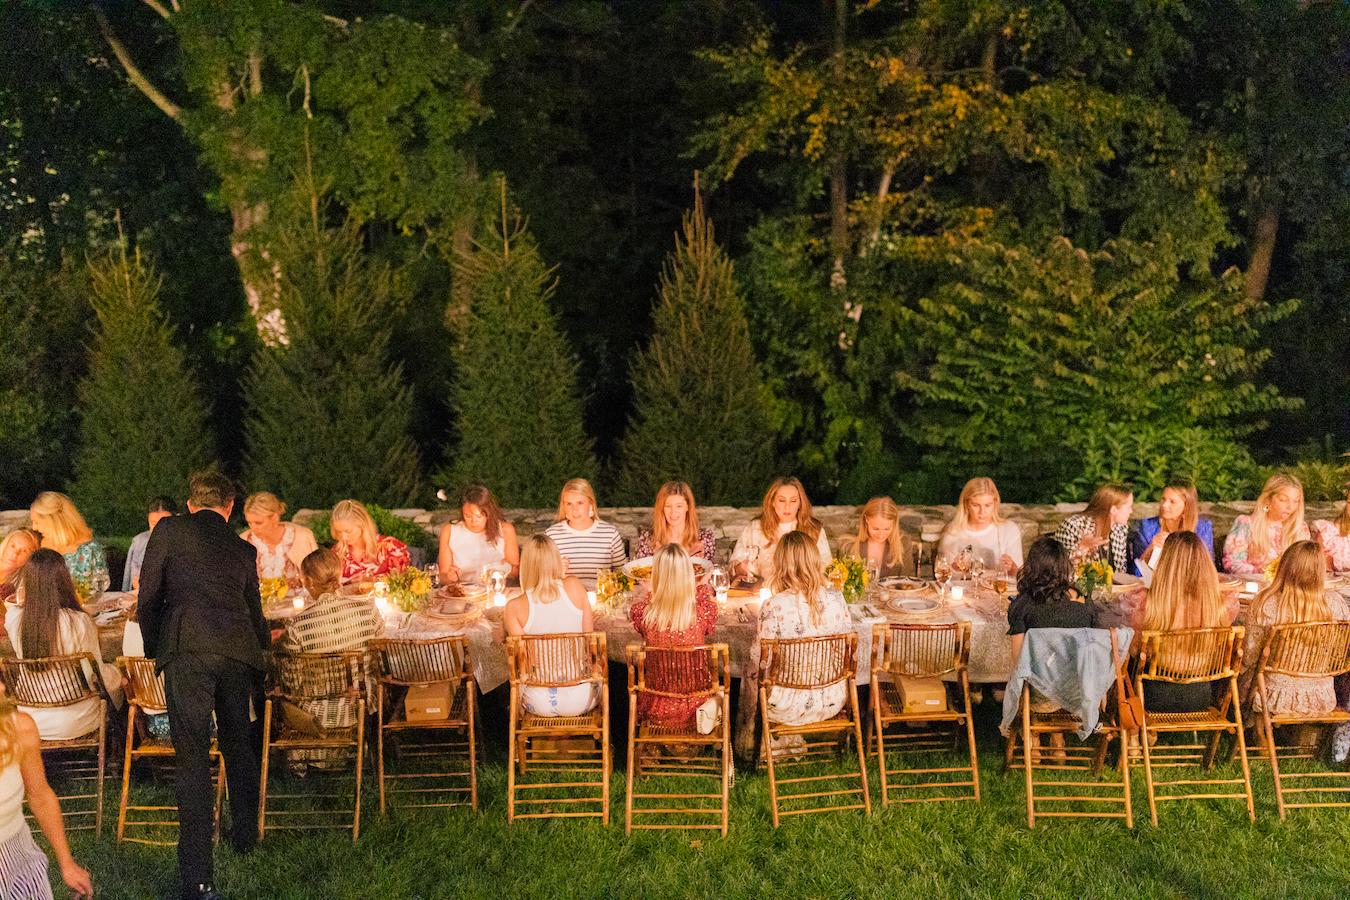 outdoor-party-ashton-keefe.jpg